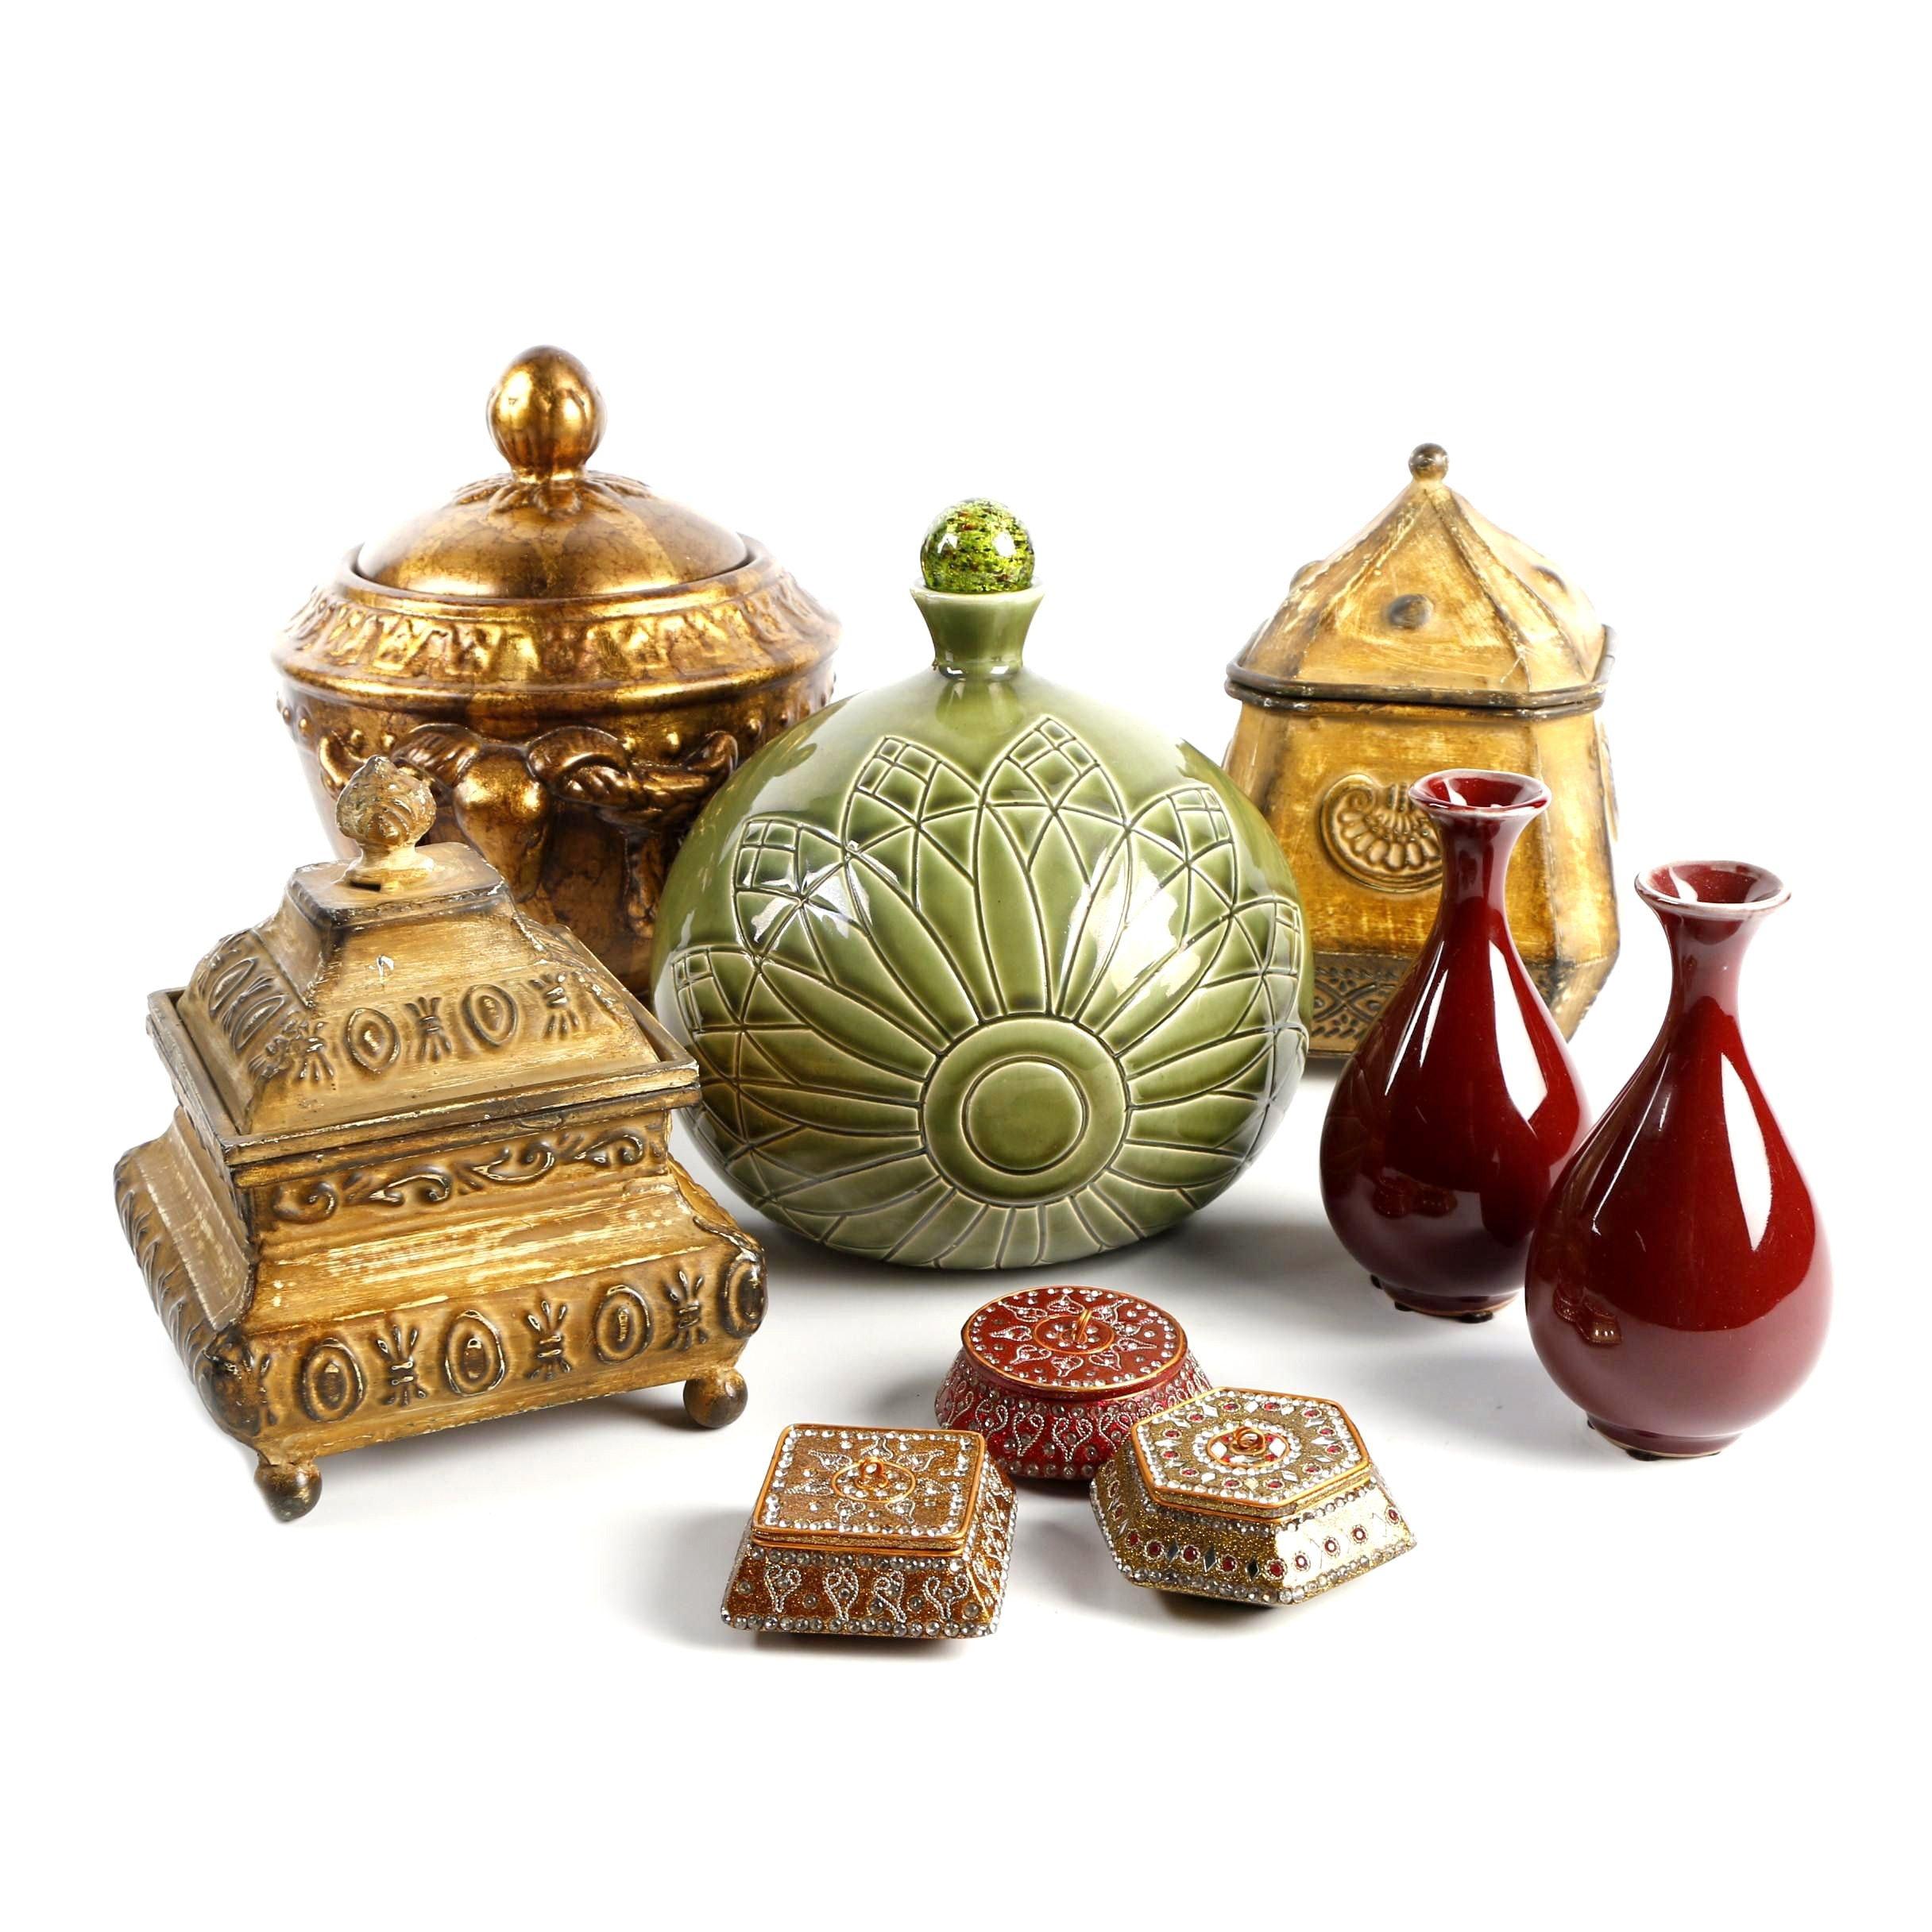 Ornate Gold Toned Decorative Boxes, Jeweled Trinket Boxes, Vases, and Jar